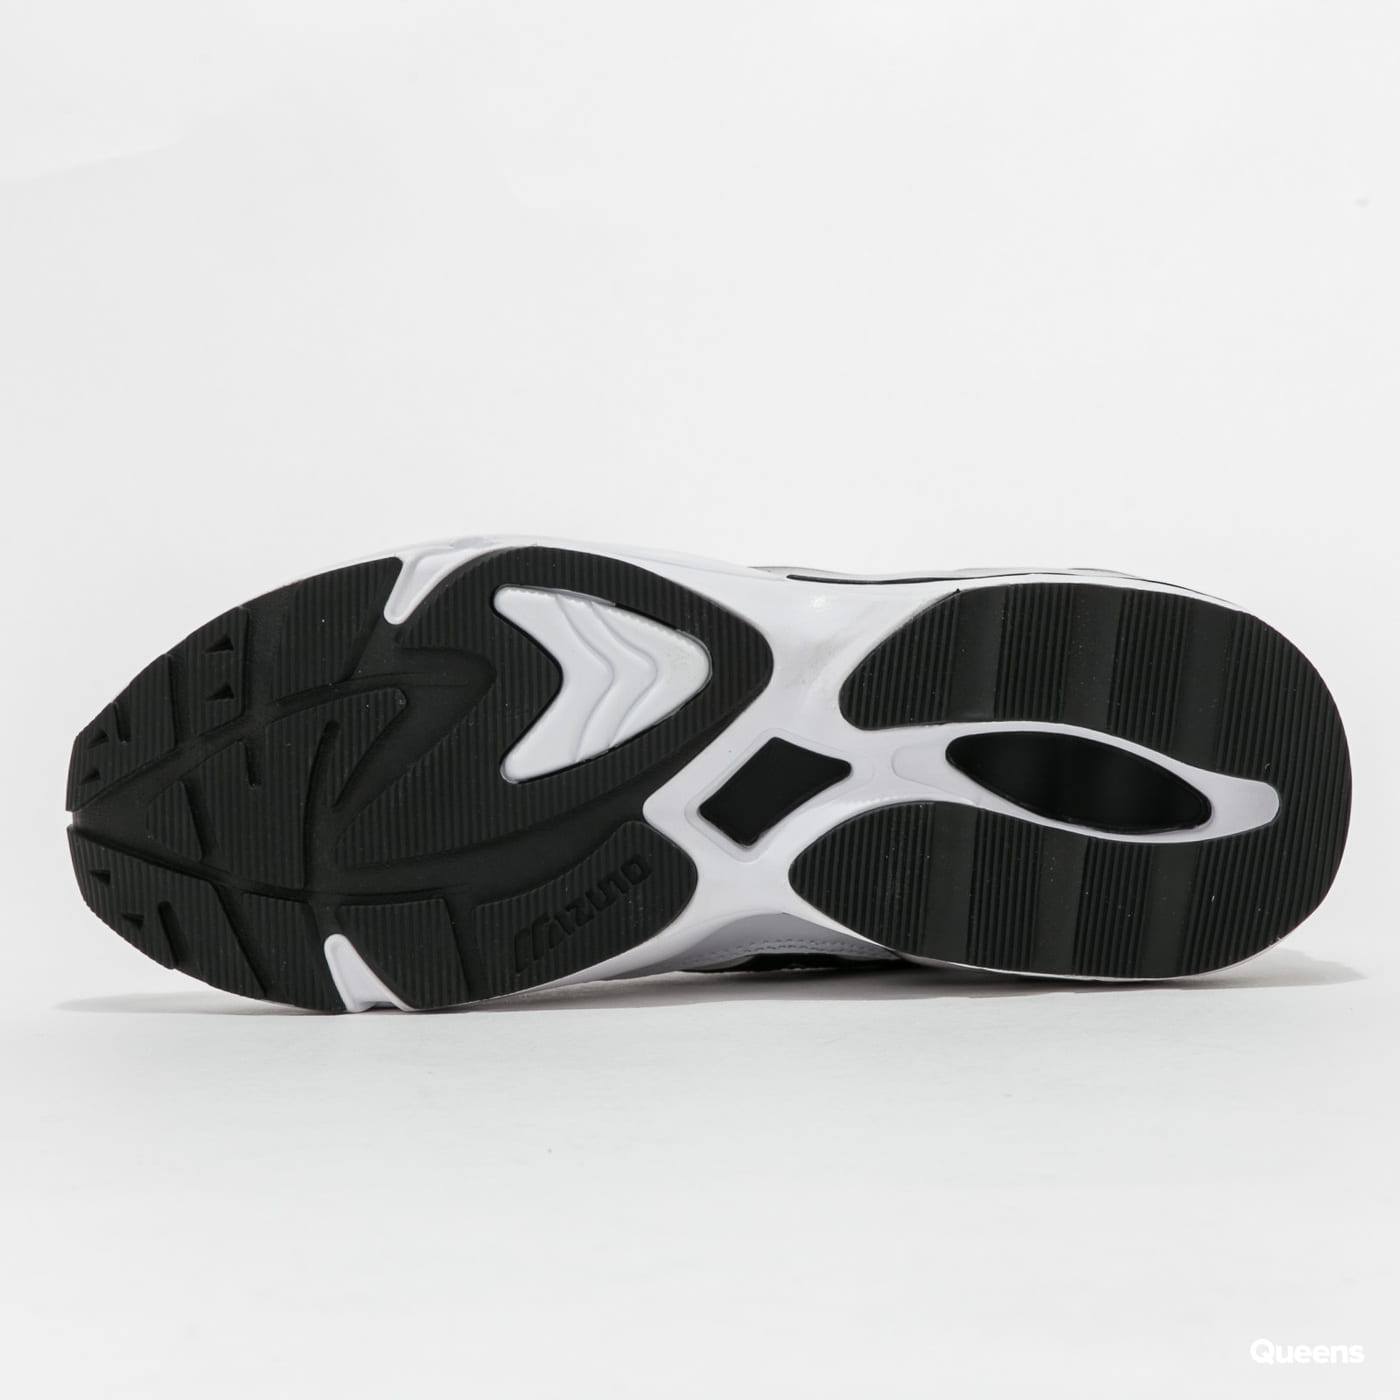 Mizuno Wave Rider 1 white / black